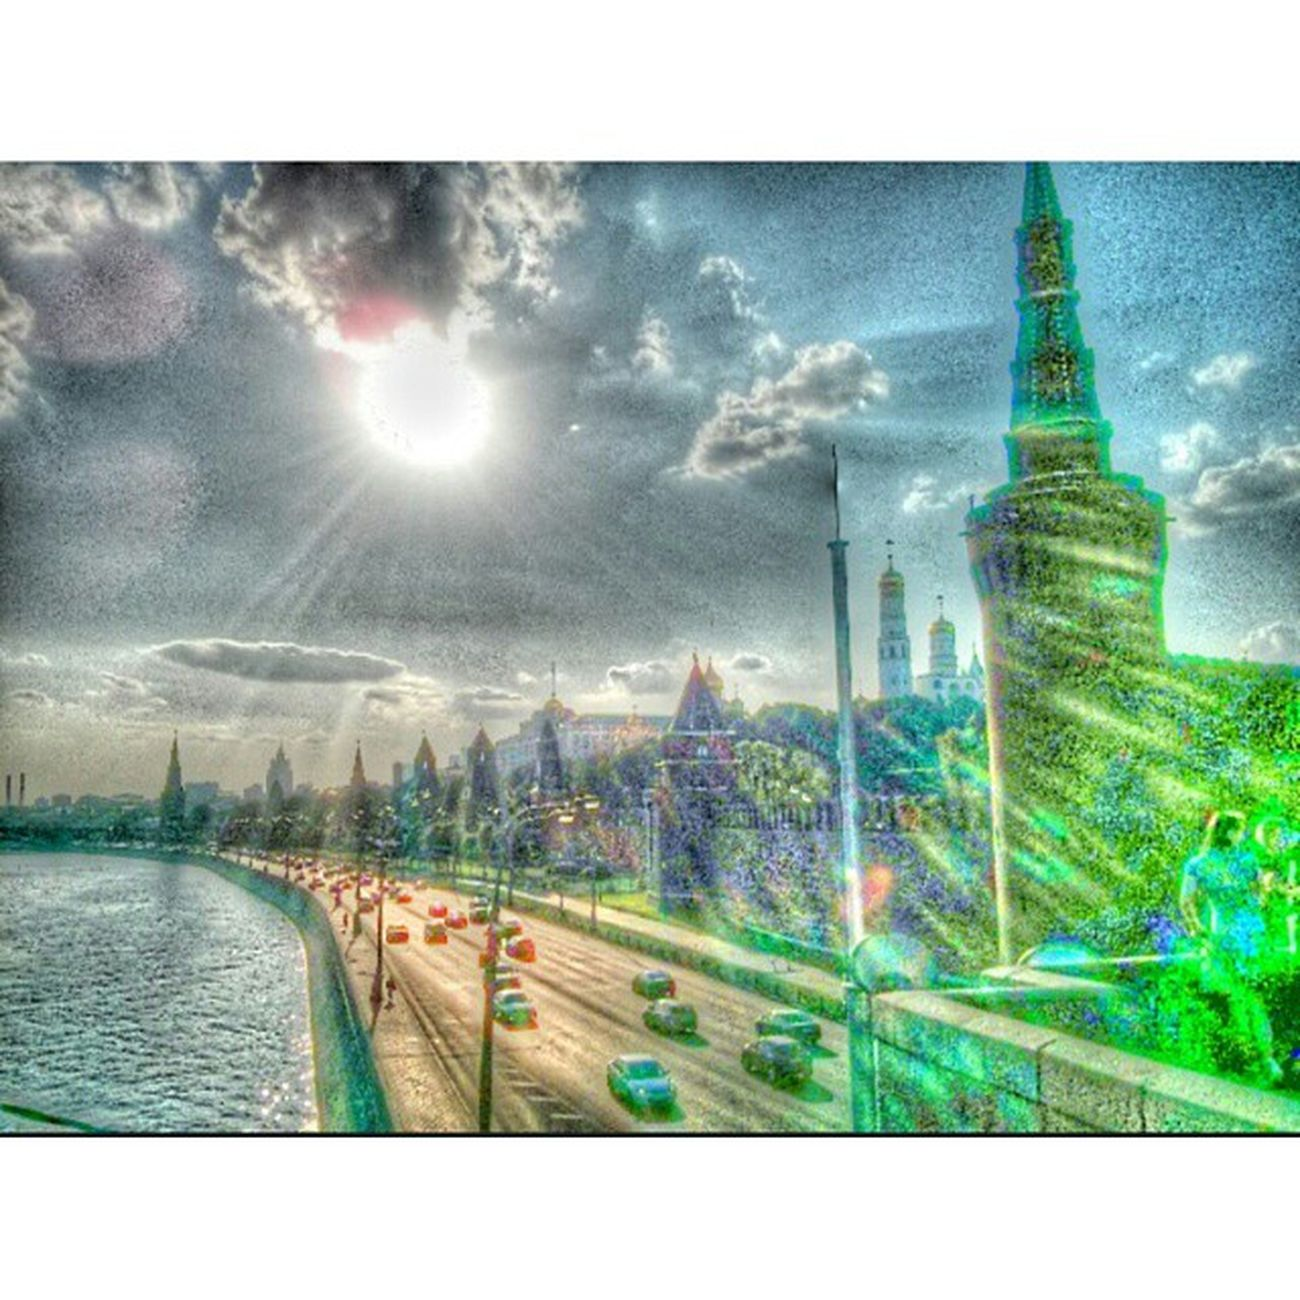 Moscow Summer Russian Funny Hot Москва Россия лето жара нашел Классный фильтр Picsart Instasize Fv5 Fv5camera Nexus4photography Nexus4 Thekremlin Dome